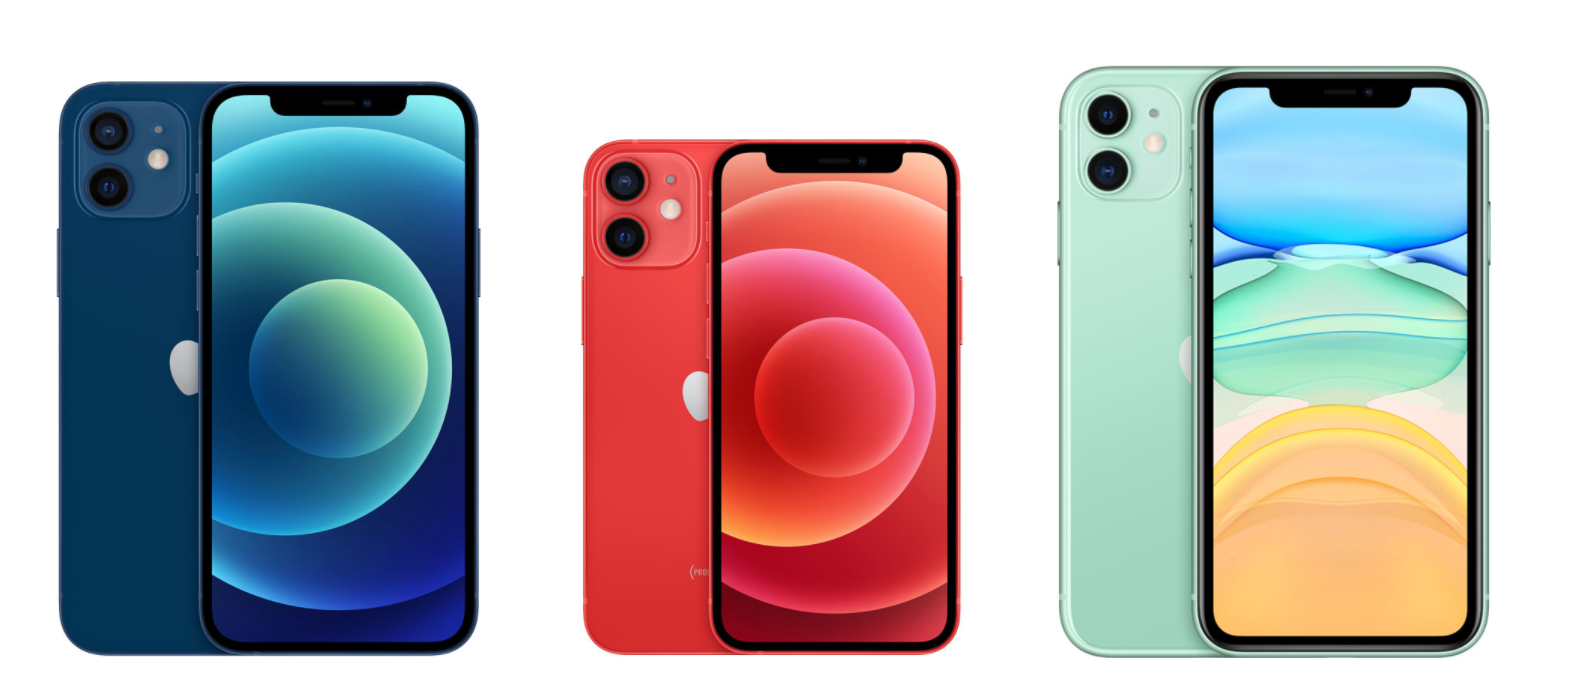 Apple iPhone 12 vs iPhone 12 Mini vs iPhone 11 vs iPhone ...